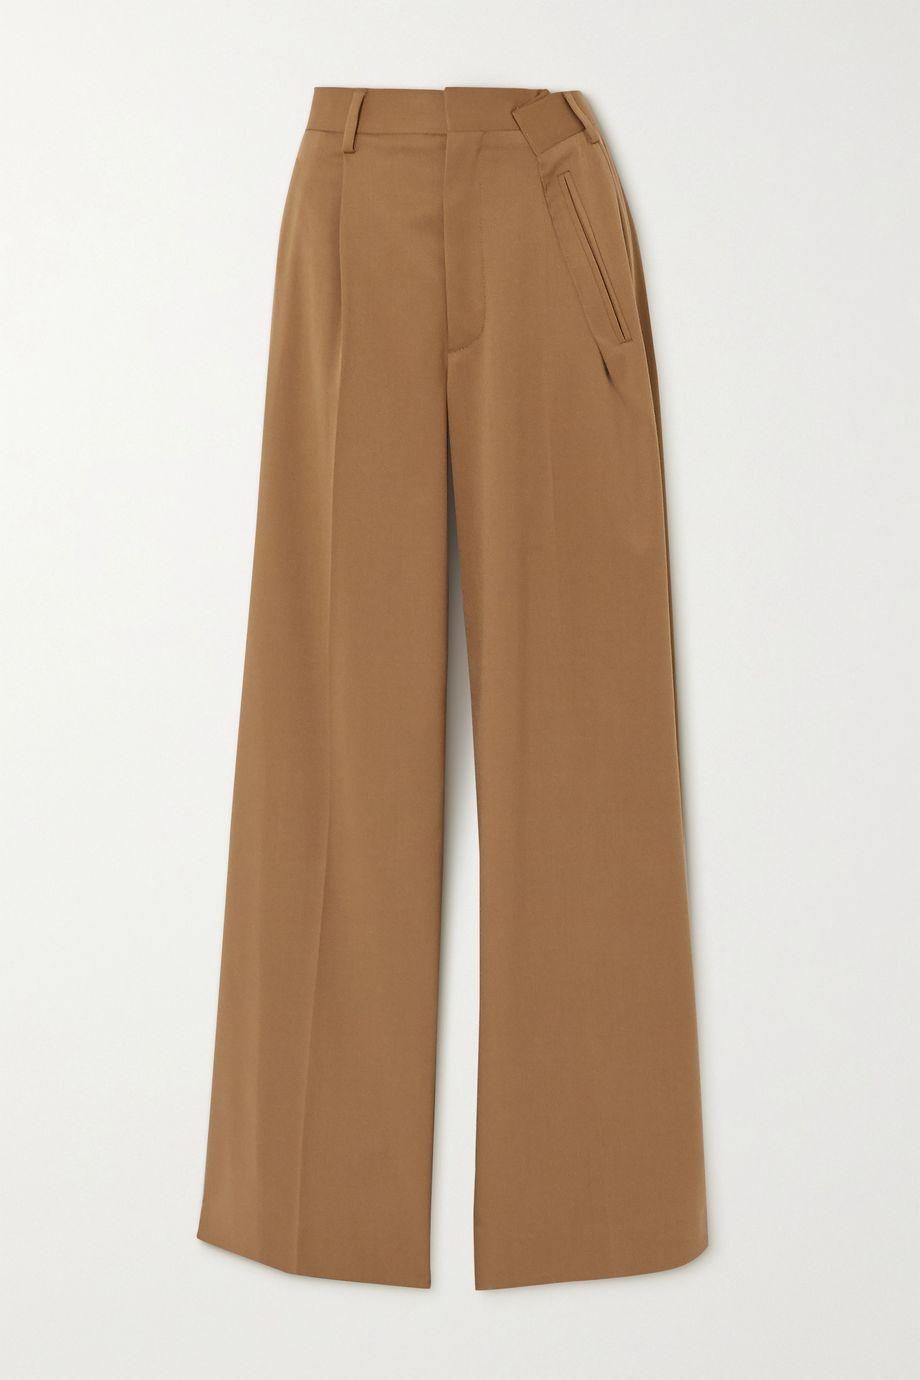 MM6 Maison Margiela 褶裥斜纹布阔腿裤